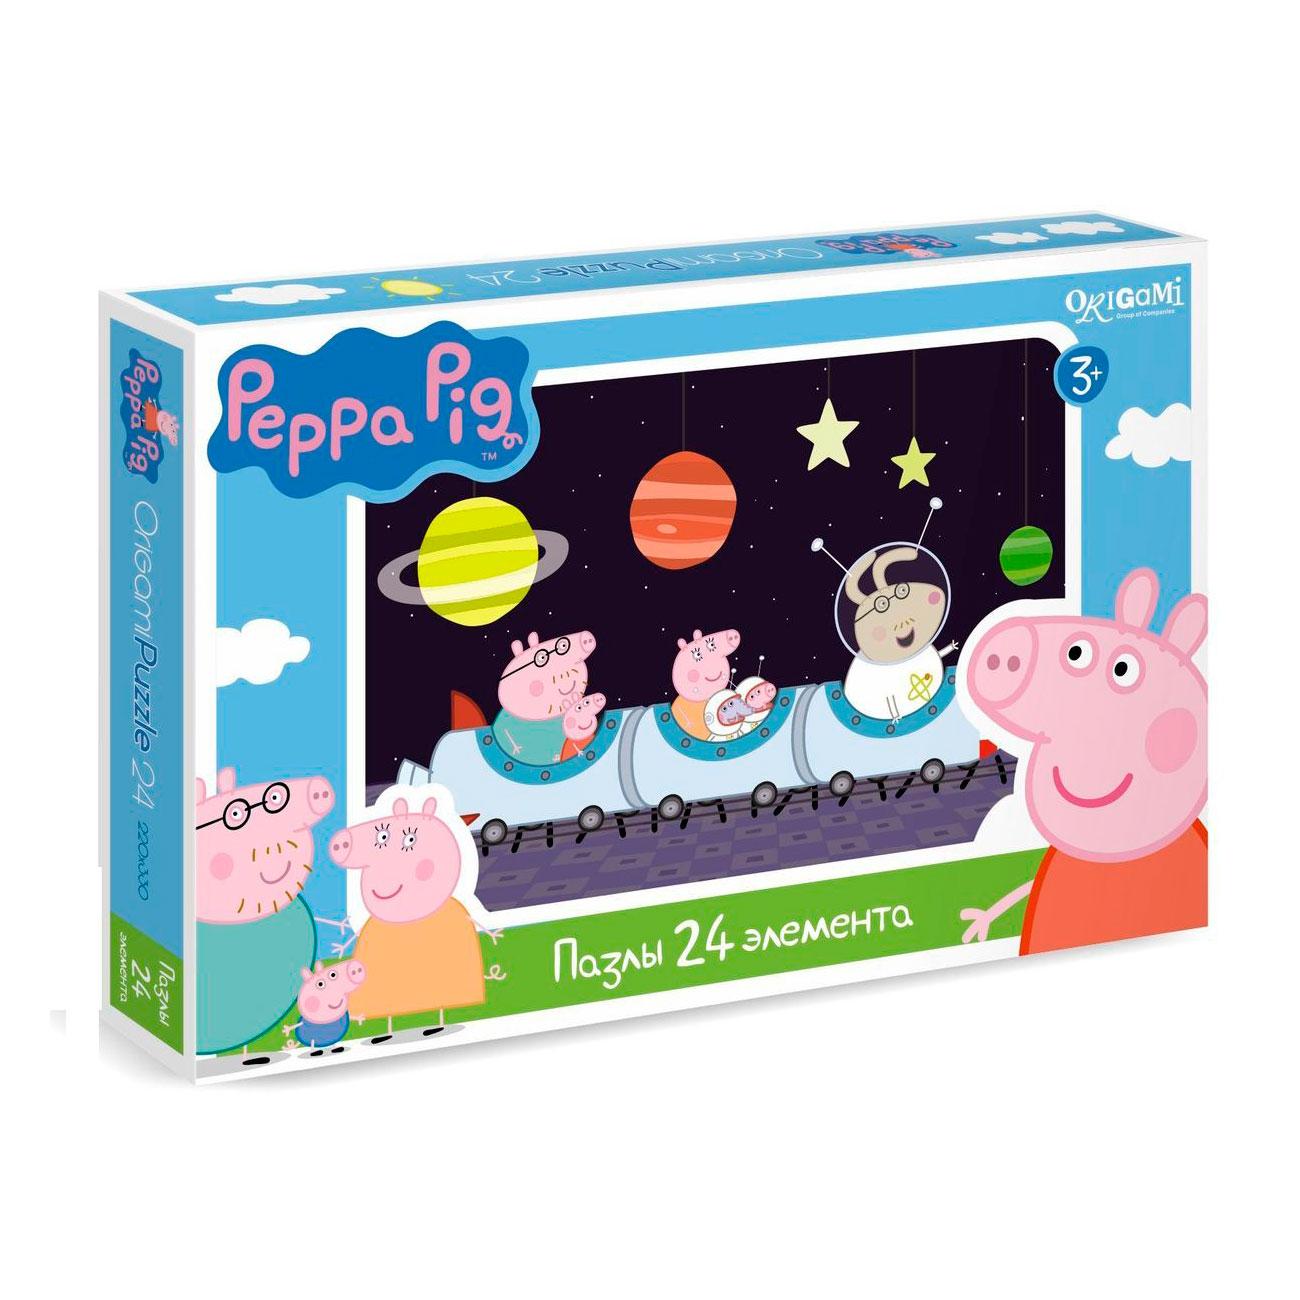 ���� Origami Peppa Pig 01568